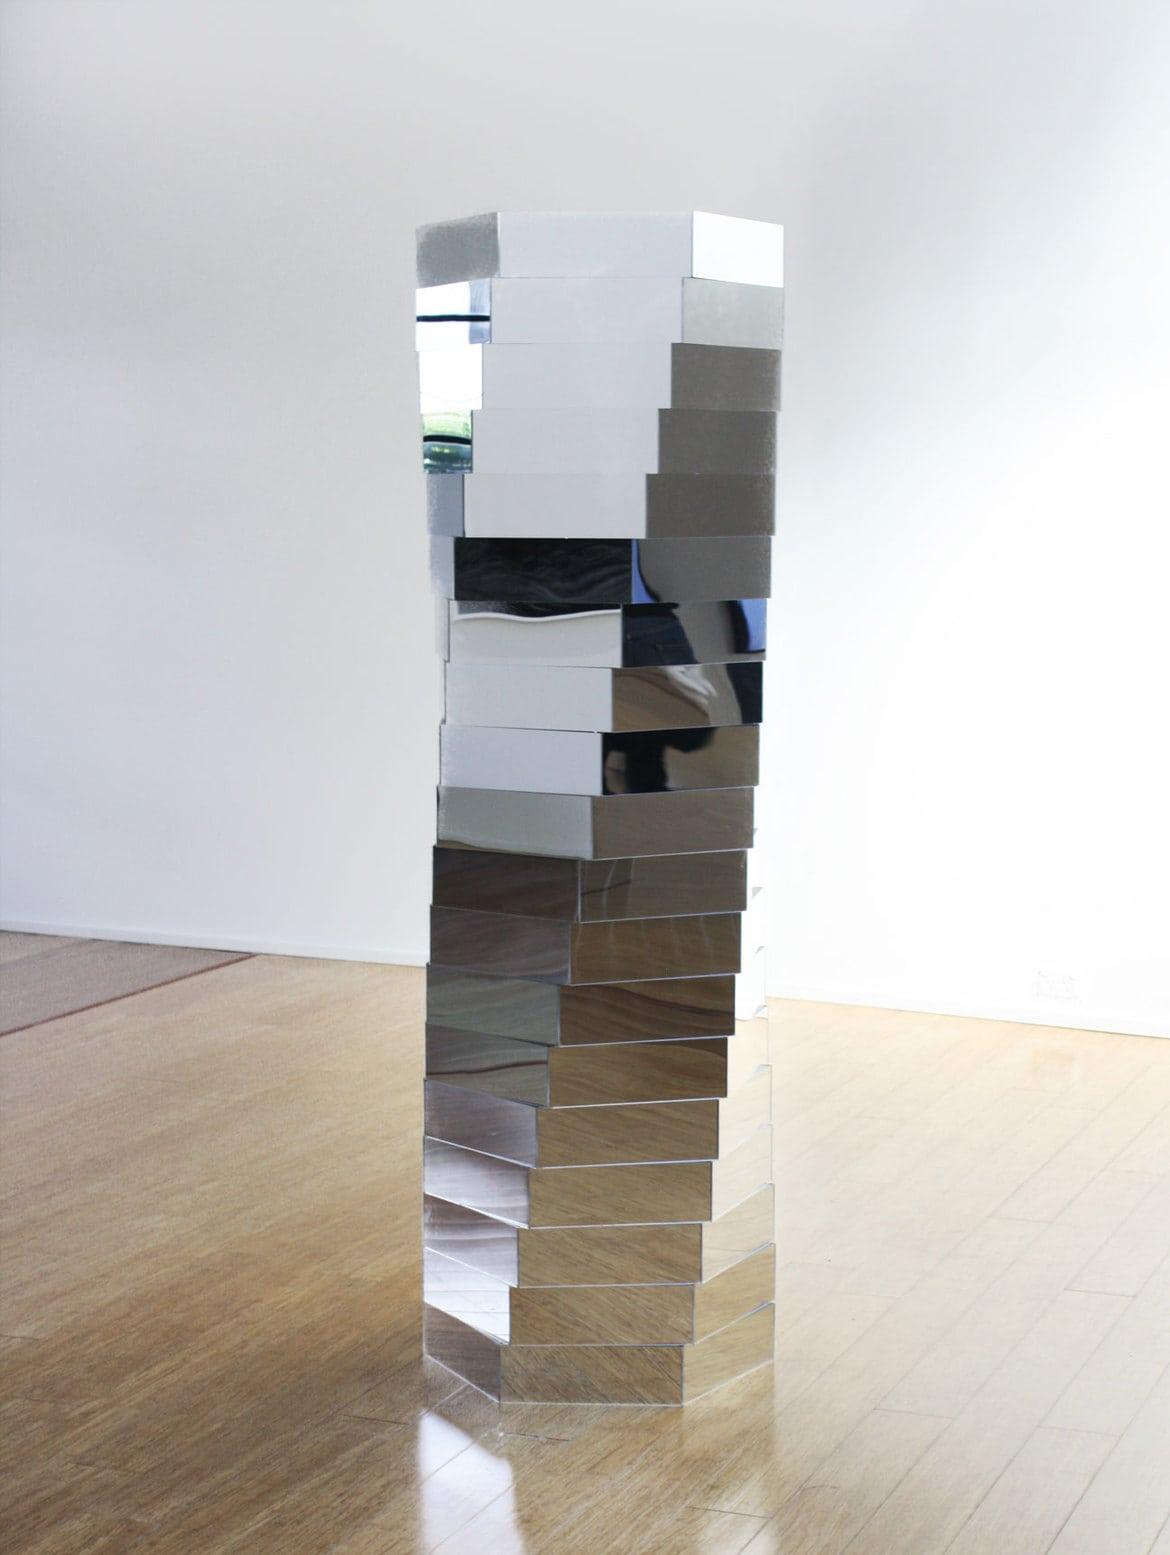 'Anticipation Machine', 2017, acrylic mirror, 190 x 70 x 70 cm, edition of 1 + 1a.p.